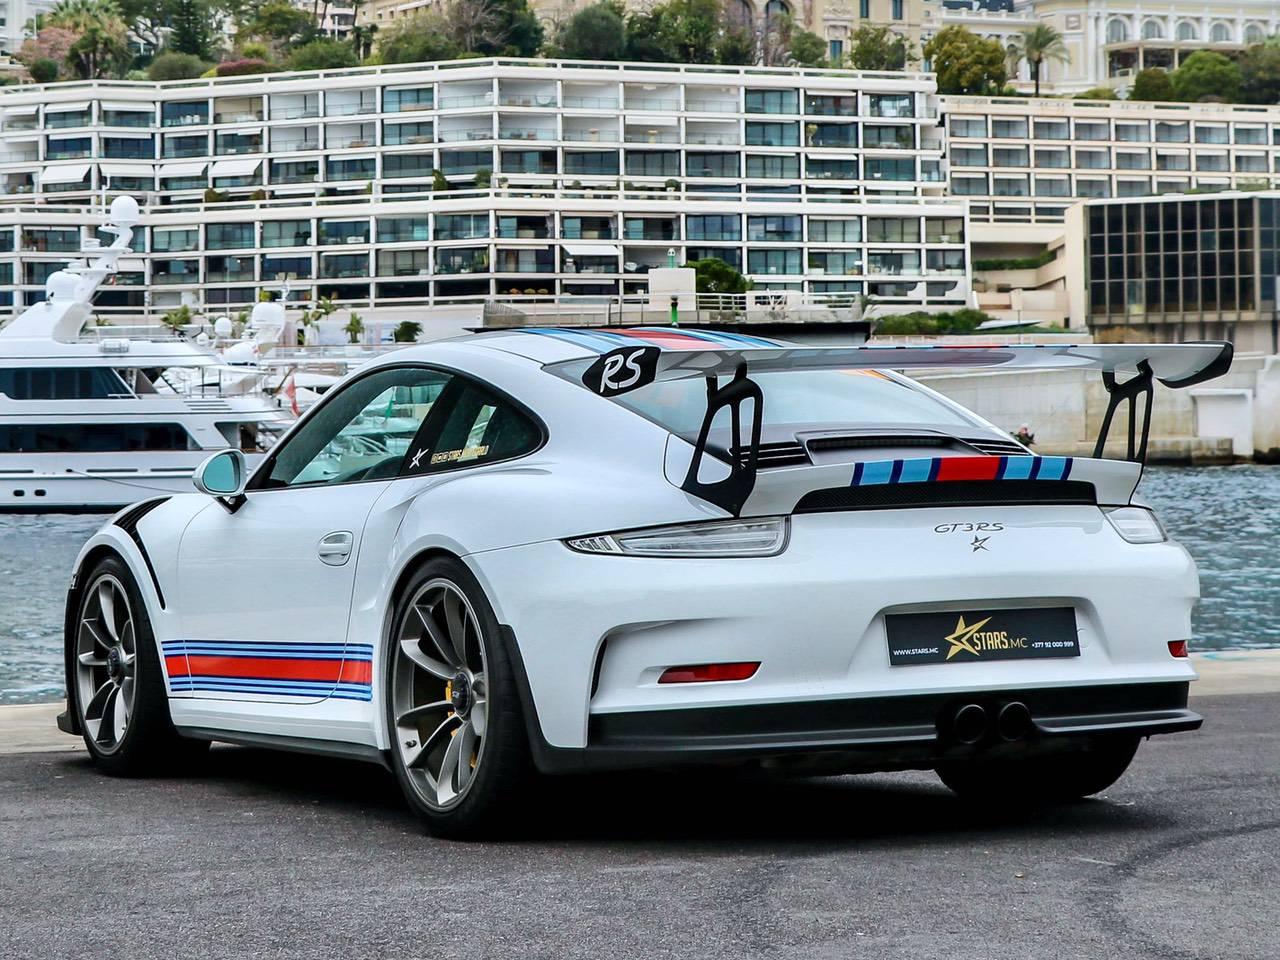 Porsche-991-Coupè-991-PDK-GT3-RS-Martini-8